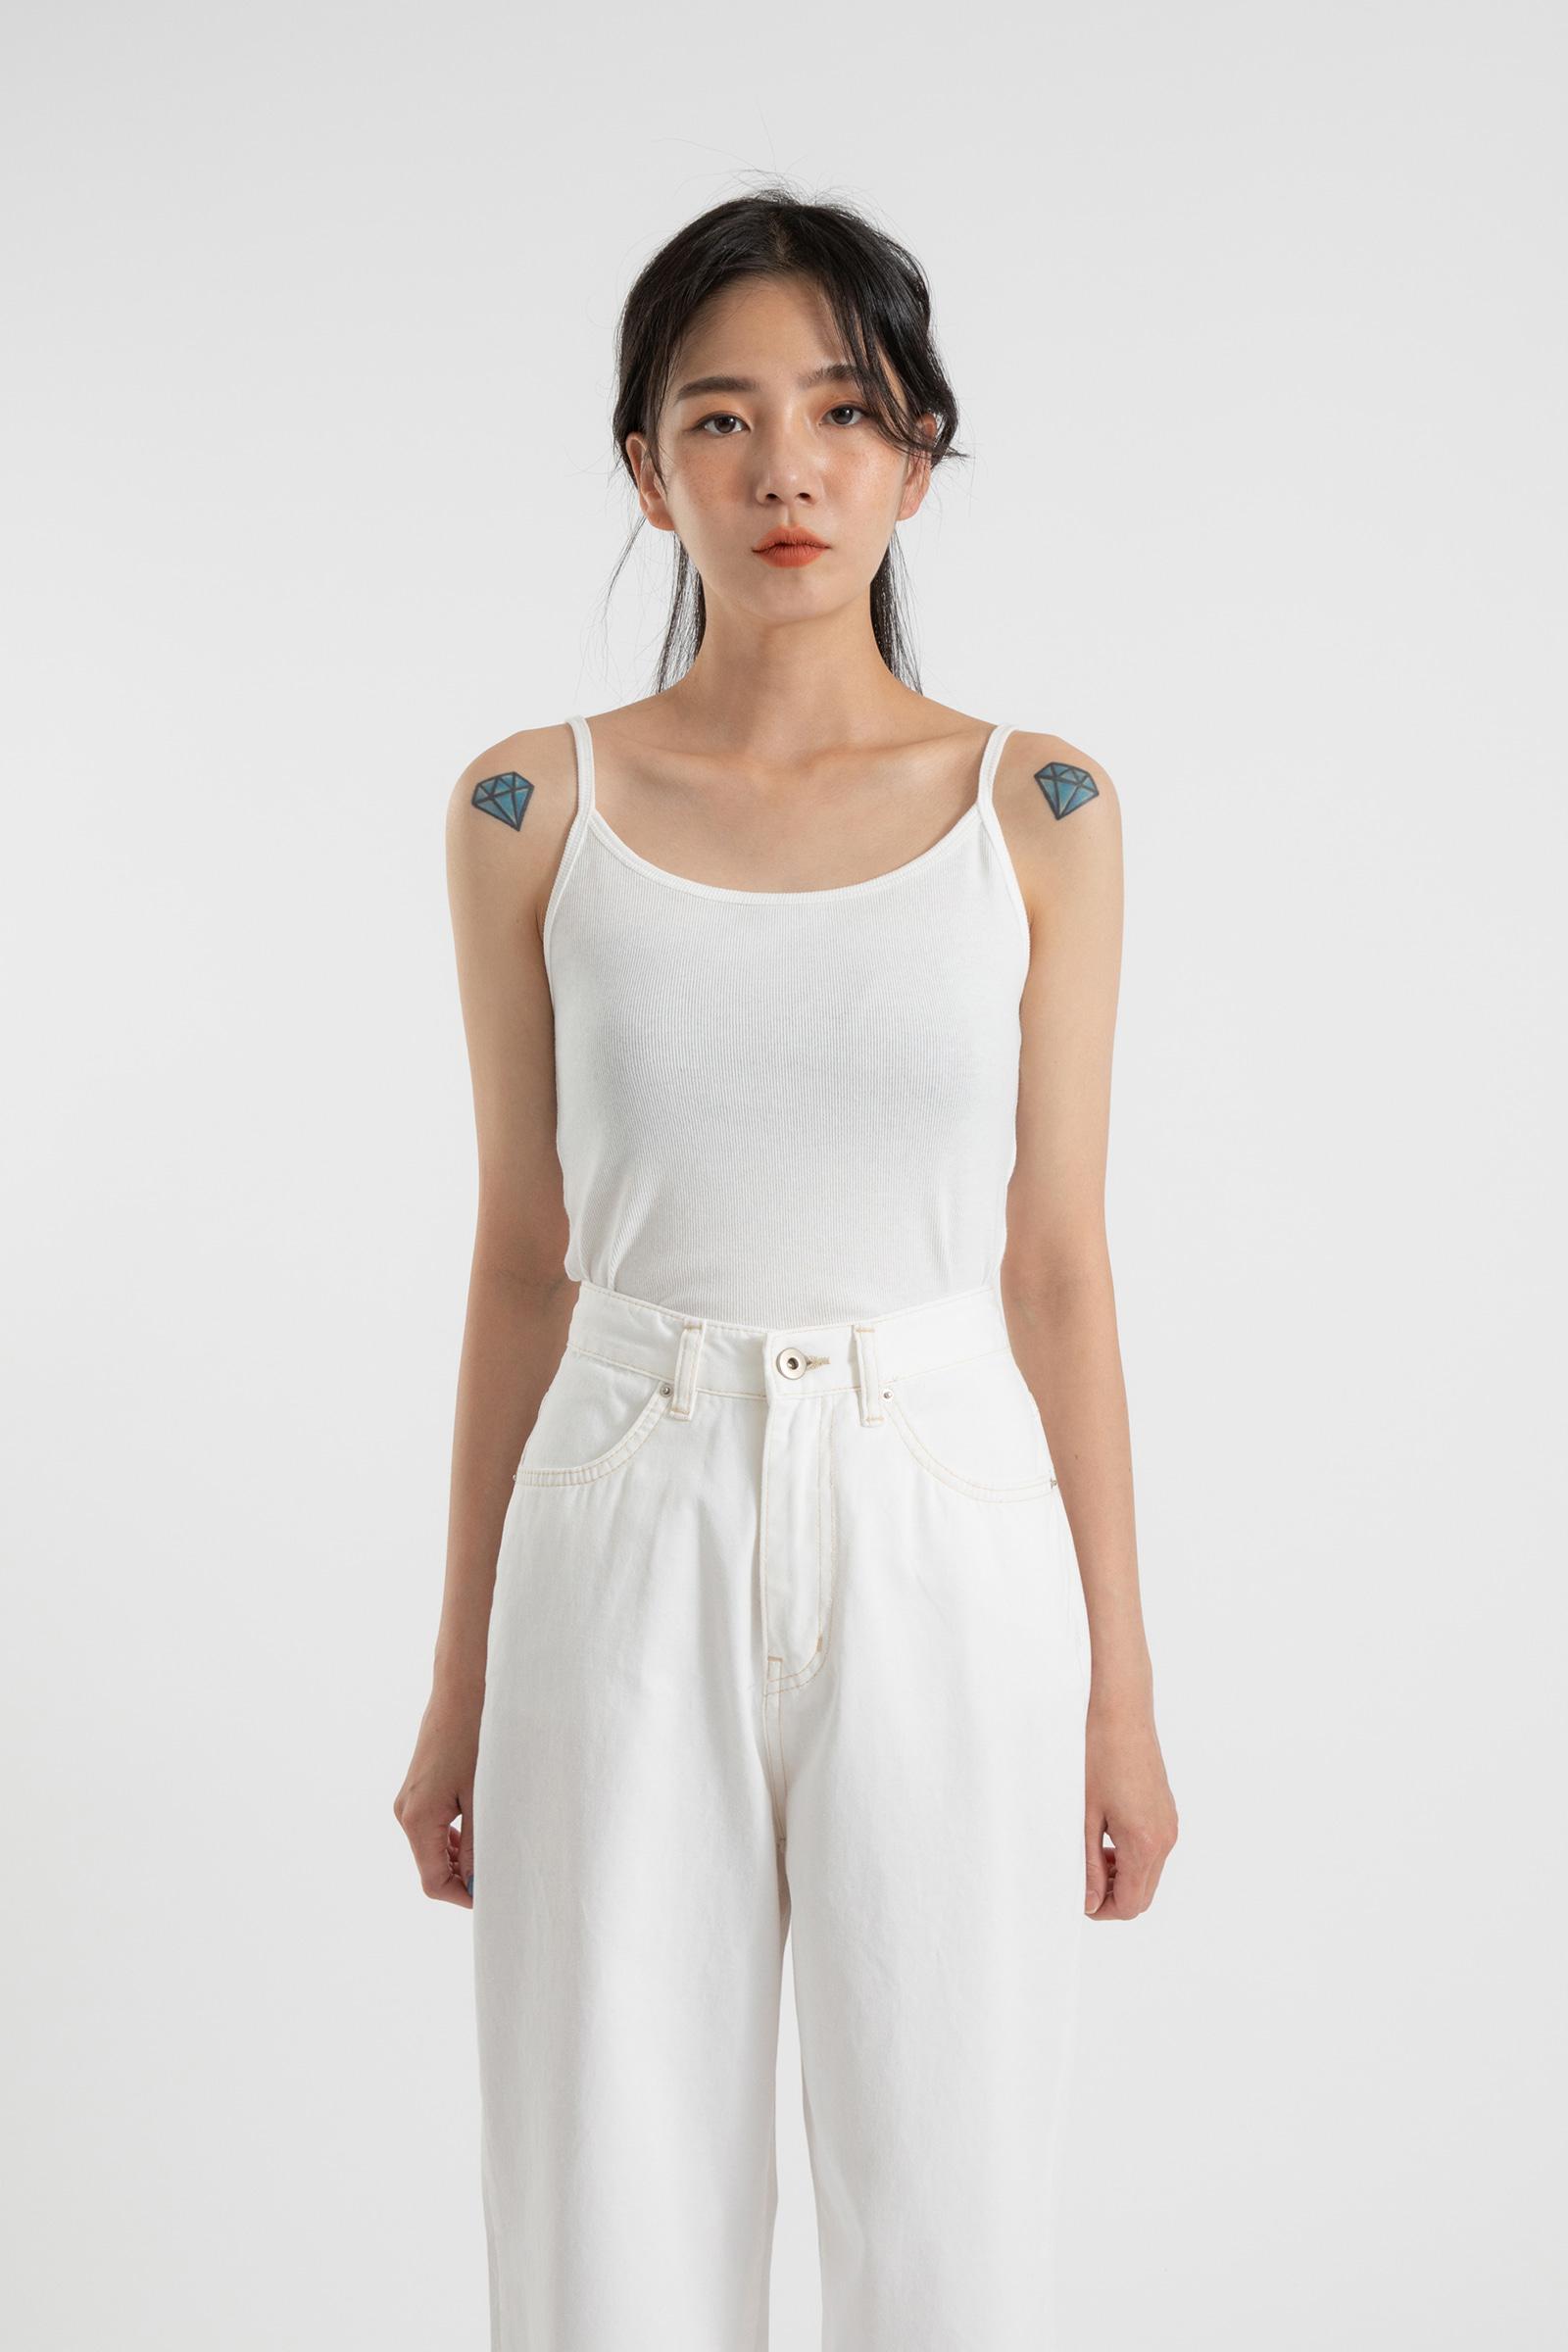 Simple slim sleeveless top